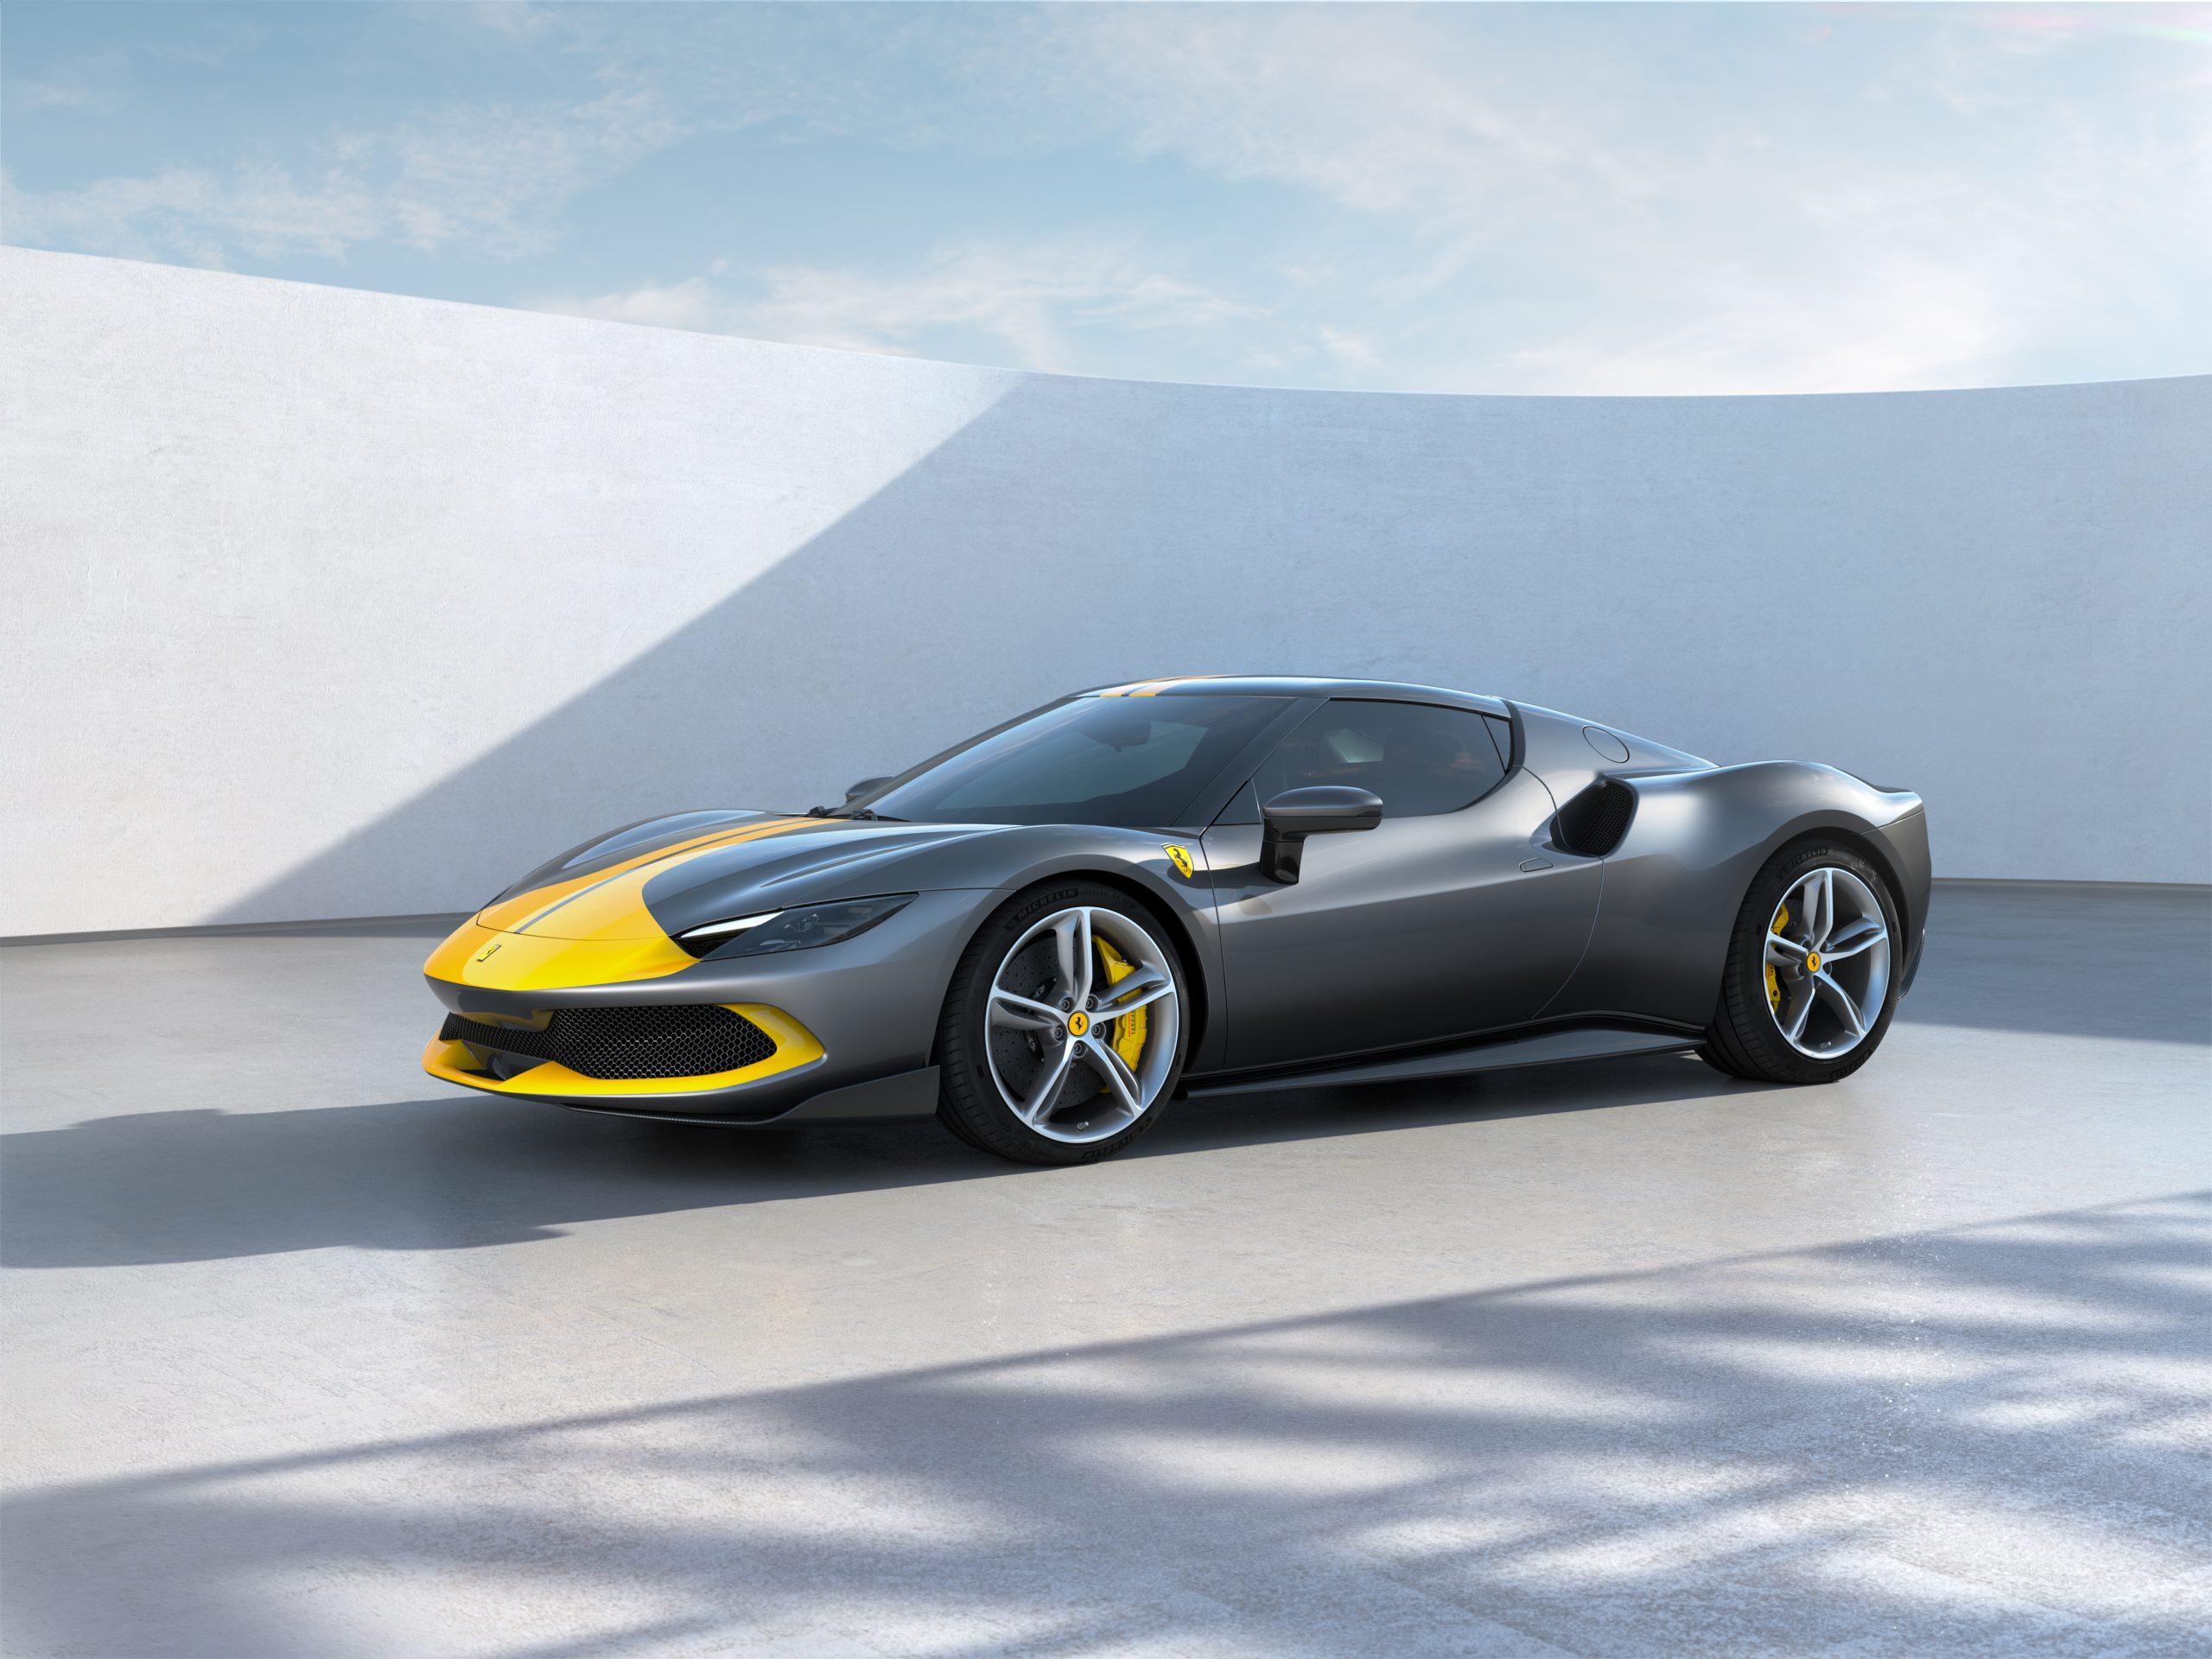 01 296 GTB Assetto Fiorano front scaled Αυτή είναι η νέα Ferrari 296GTB 296GTB, Ferrari, Ferrari 296GTB, supercar, supercars, zblog, ειδήσεις, Νέα